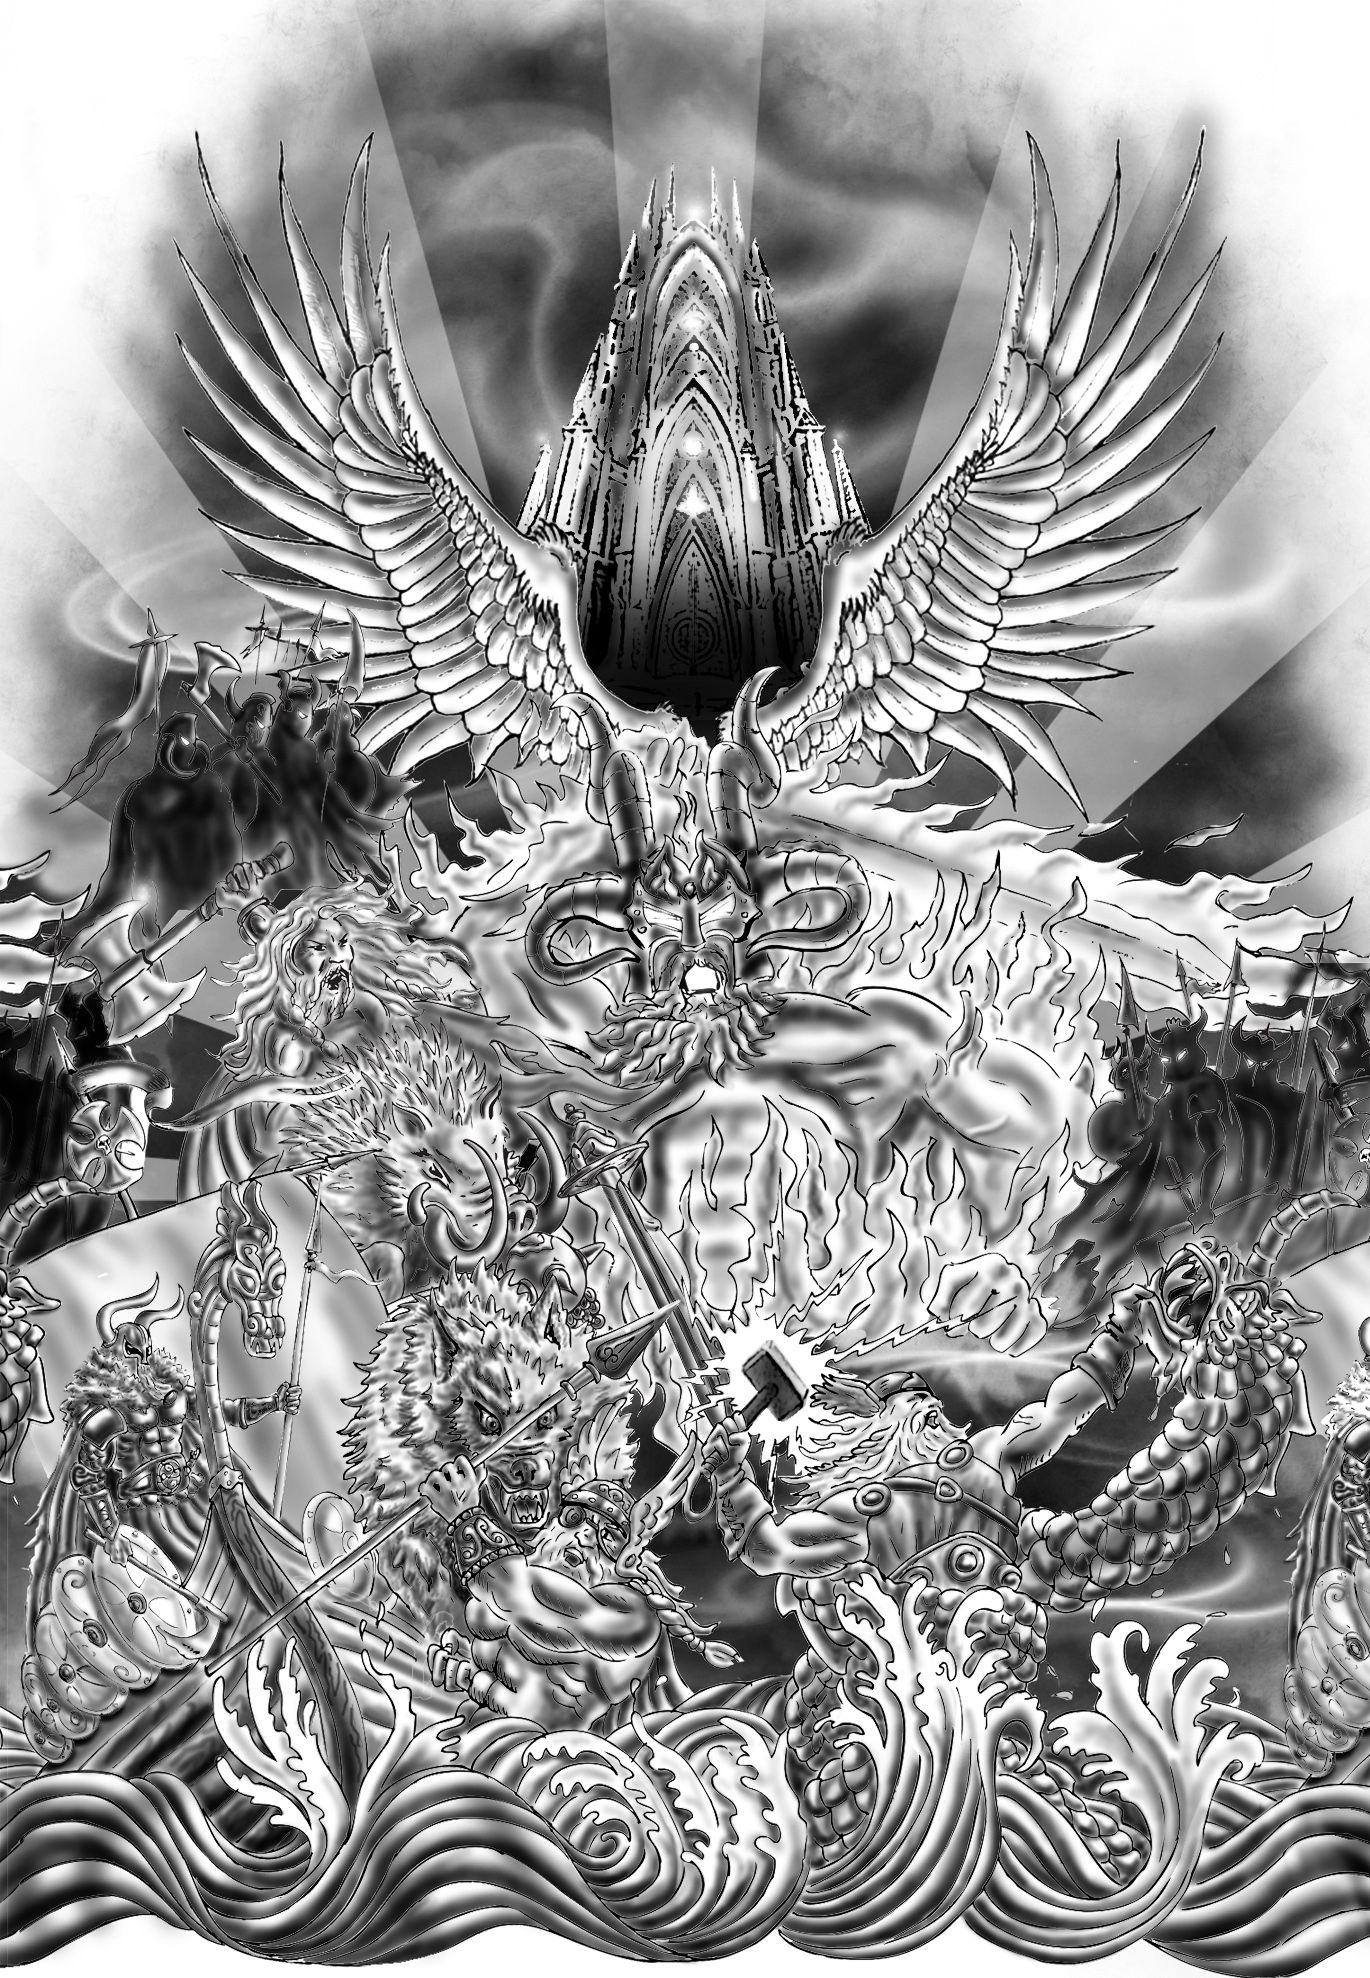 Ragnarok Custom Tattoo Design By Lucius In Fabula Norse Tattoo Custom Tattoo Design Viking Tattoos